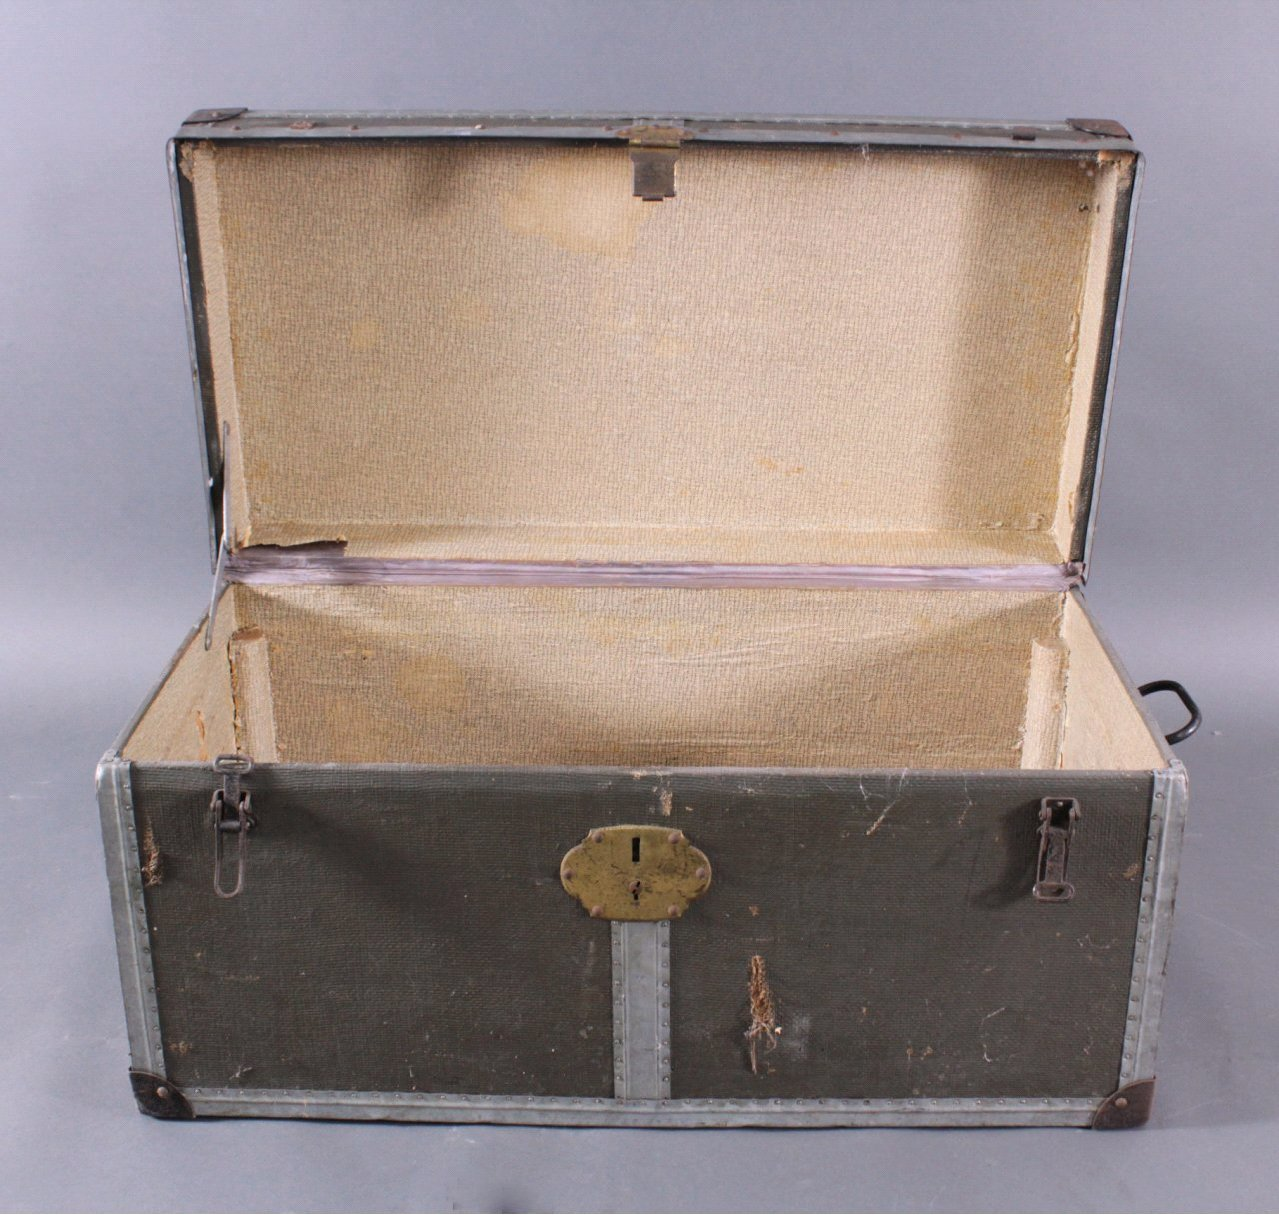 Koffer bzw. Reisetruhe um 1900